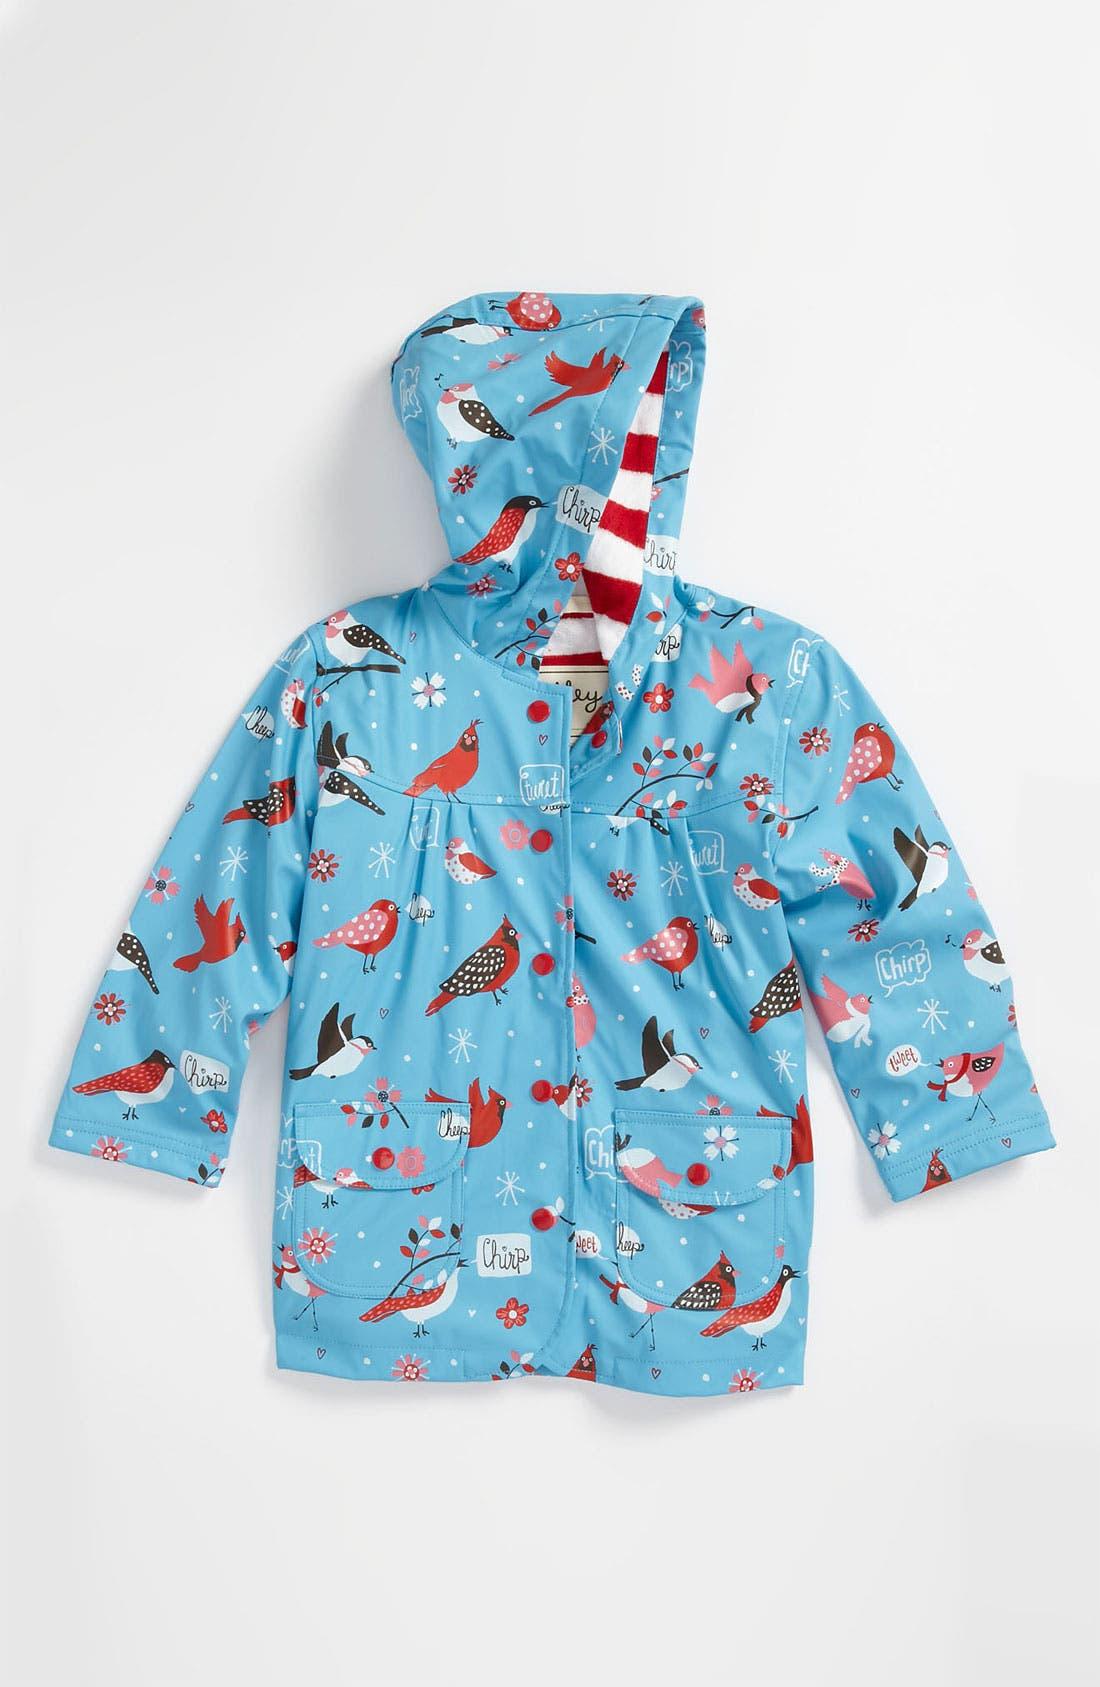 Main Image - Hatley 'Winter Birds' Rain Jacket (Infant, Toddler, Little Girls & Big Girls)